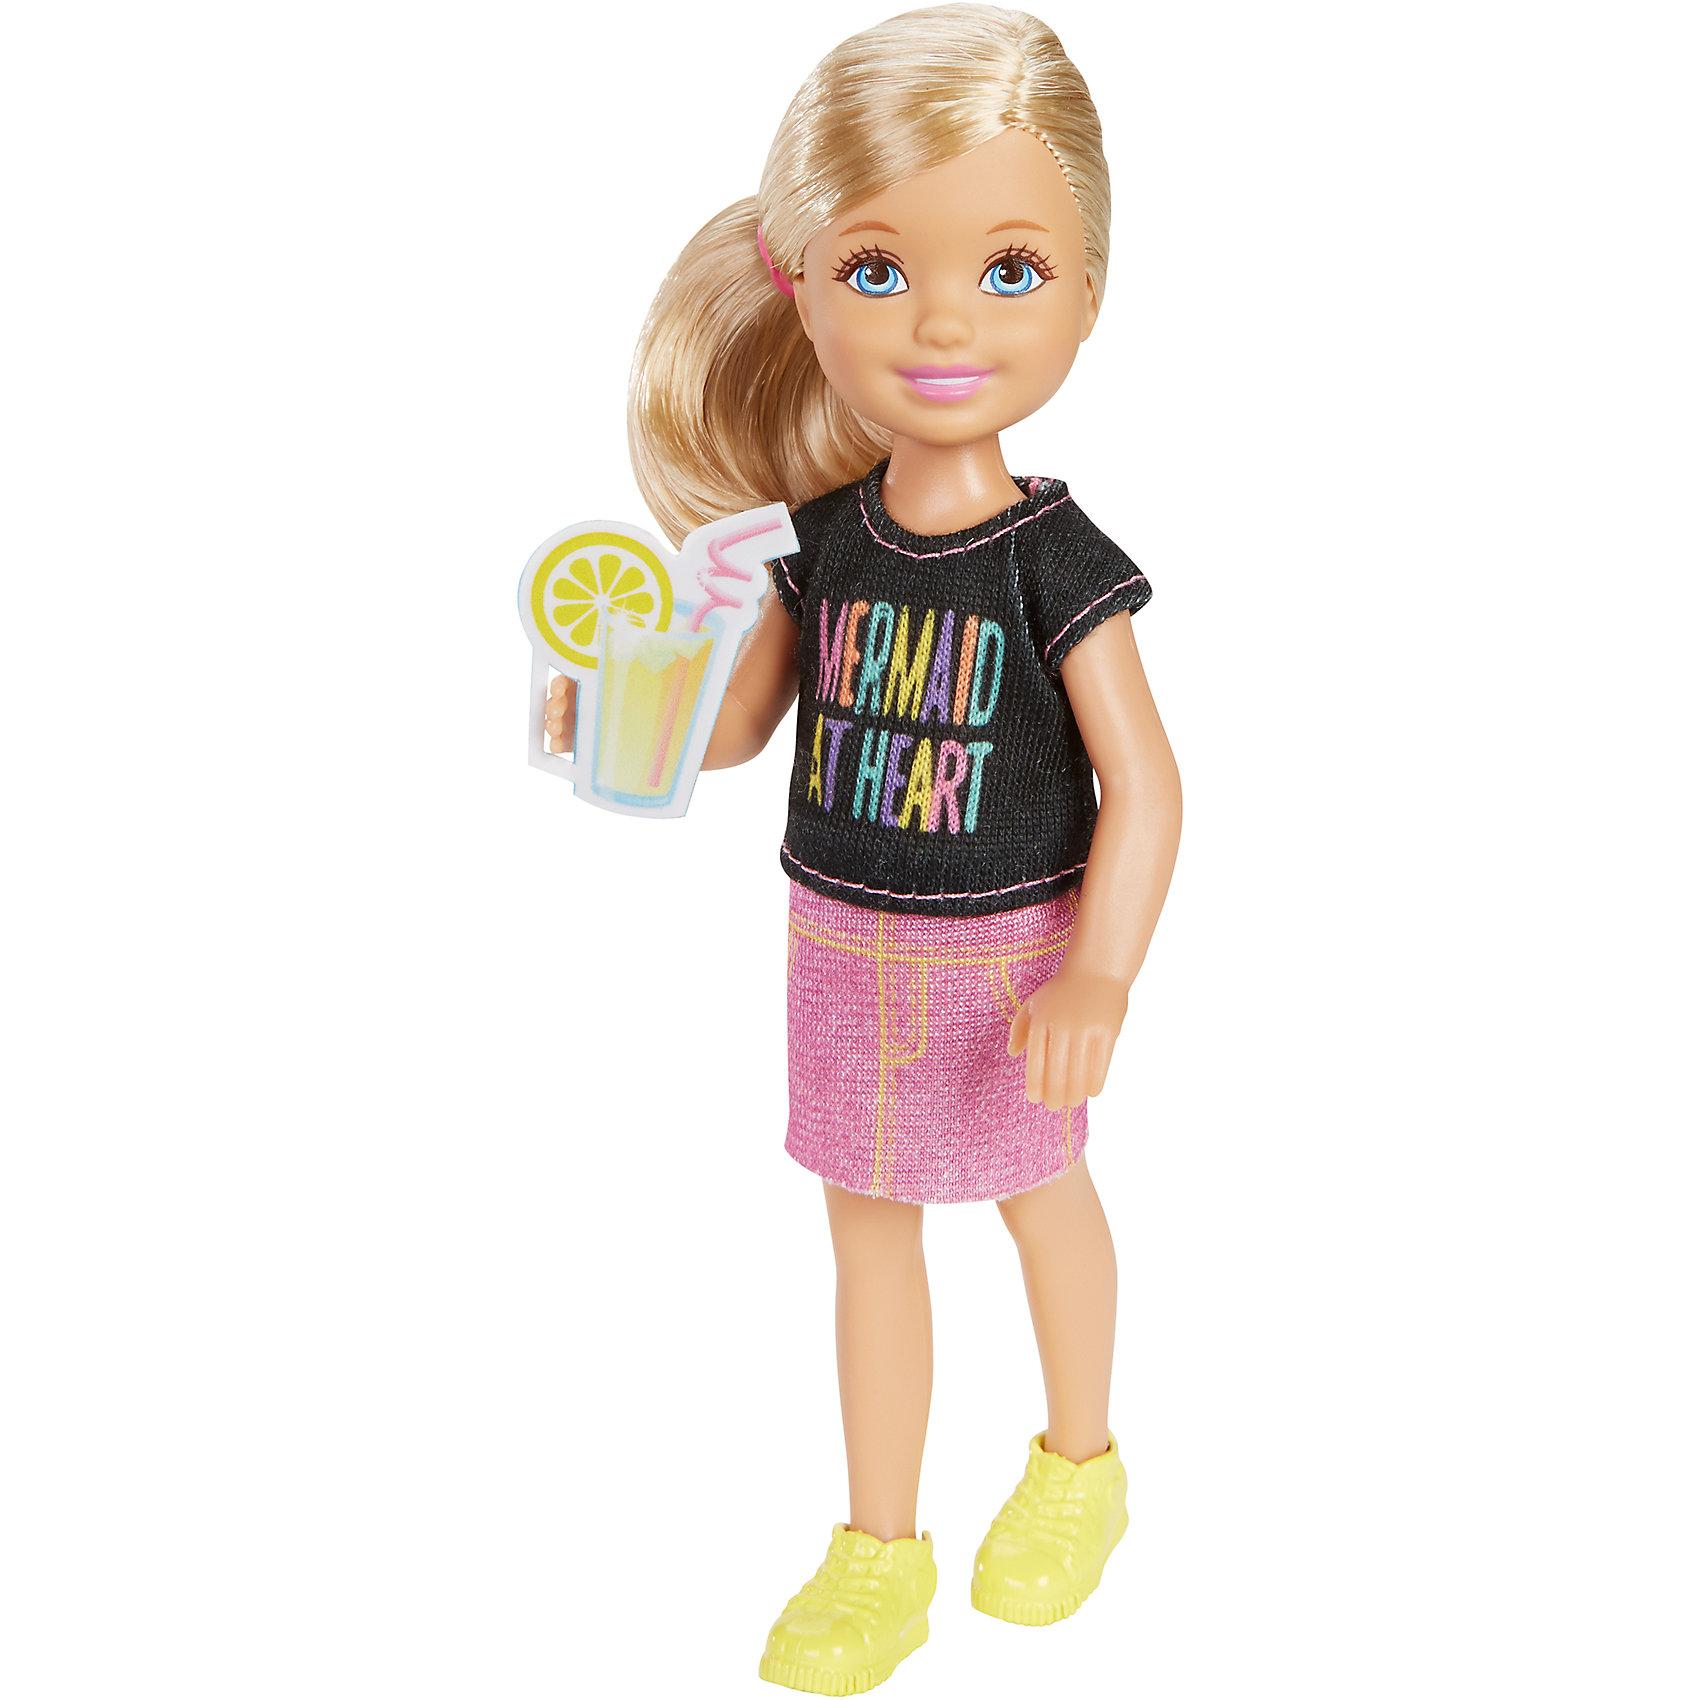 Кукла Челси с аксессуарами, Barbie